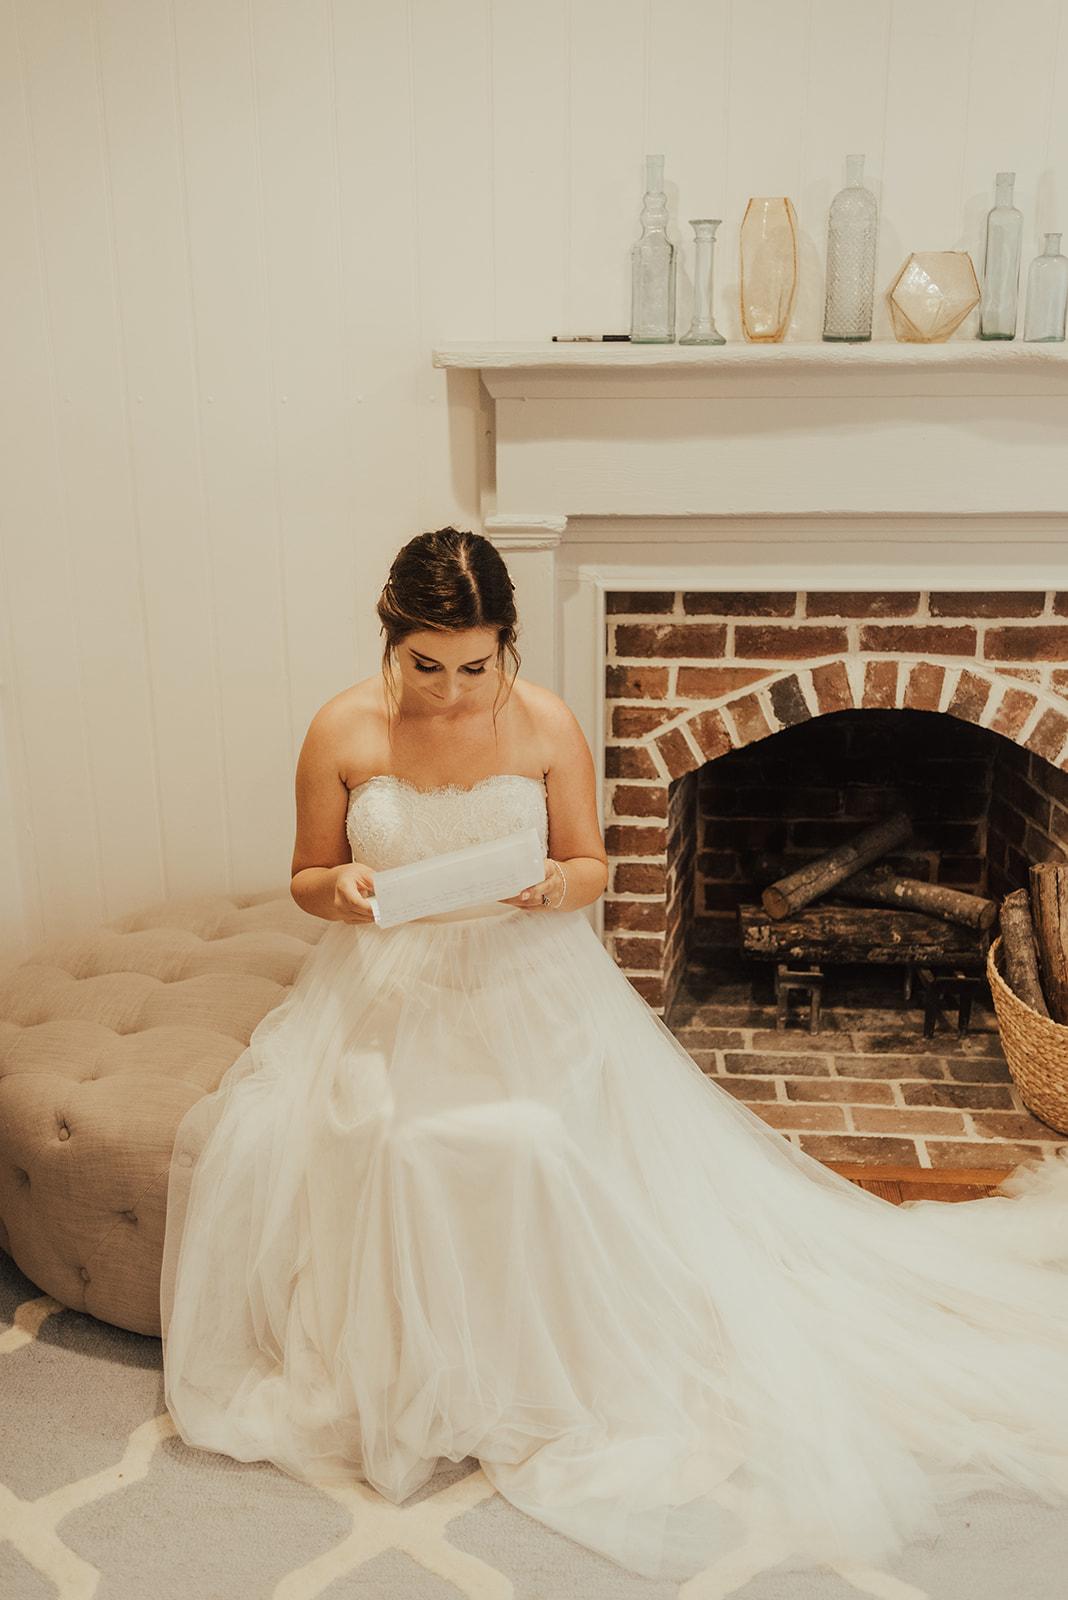 Richmond VA Wedding By SB Photographs143143143.jpg